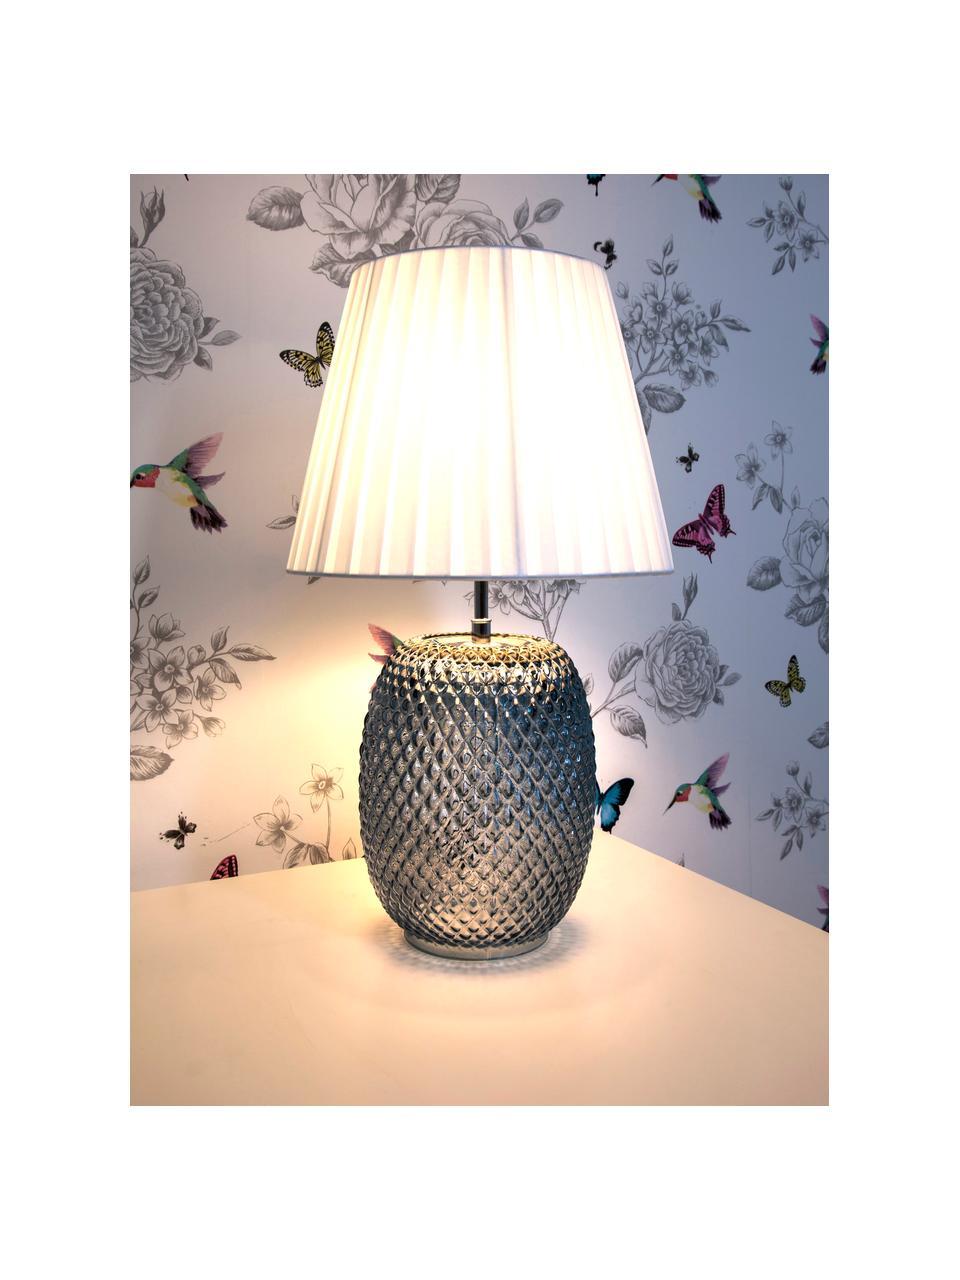 Tafellamp Cornelia van glas, Lampenkap: polyester, Lampvoet: glas, Blauw, wit, Ø 25 x H 42 cm